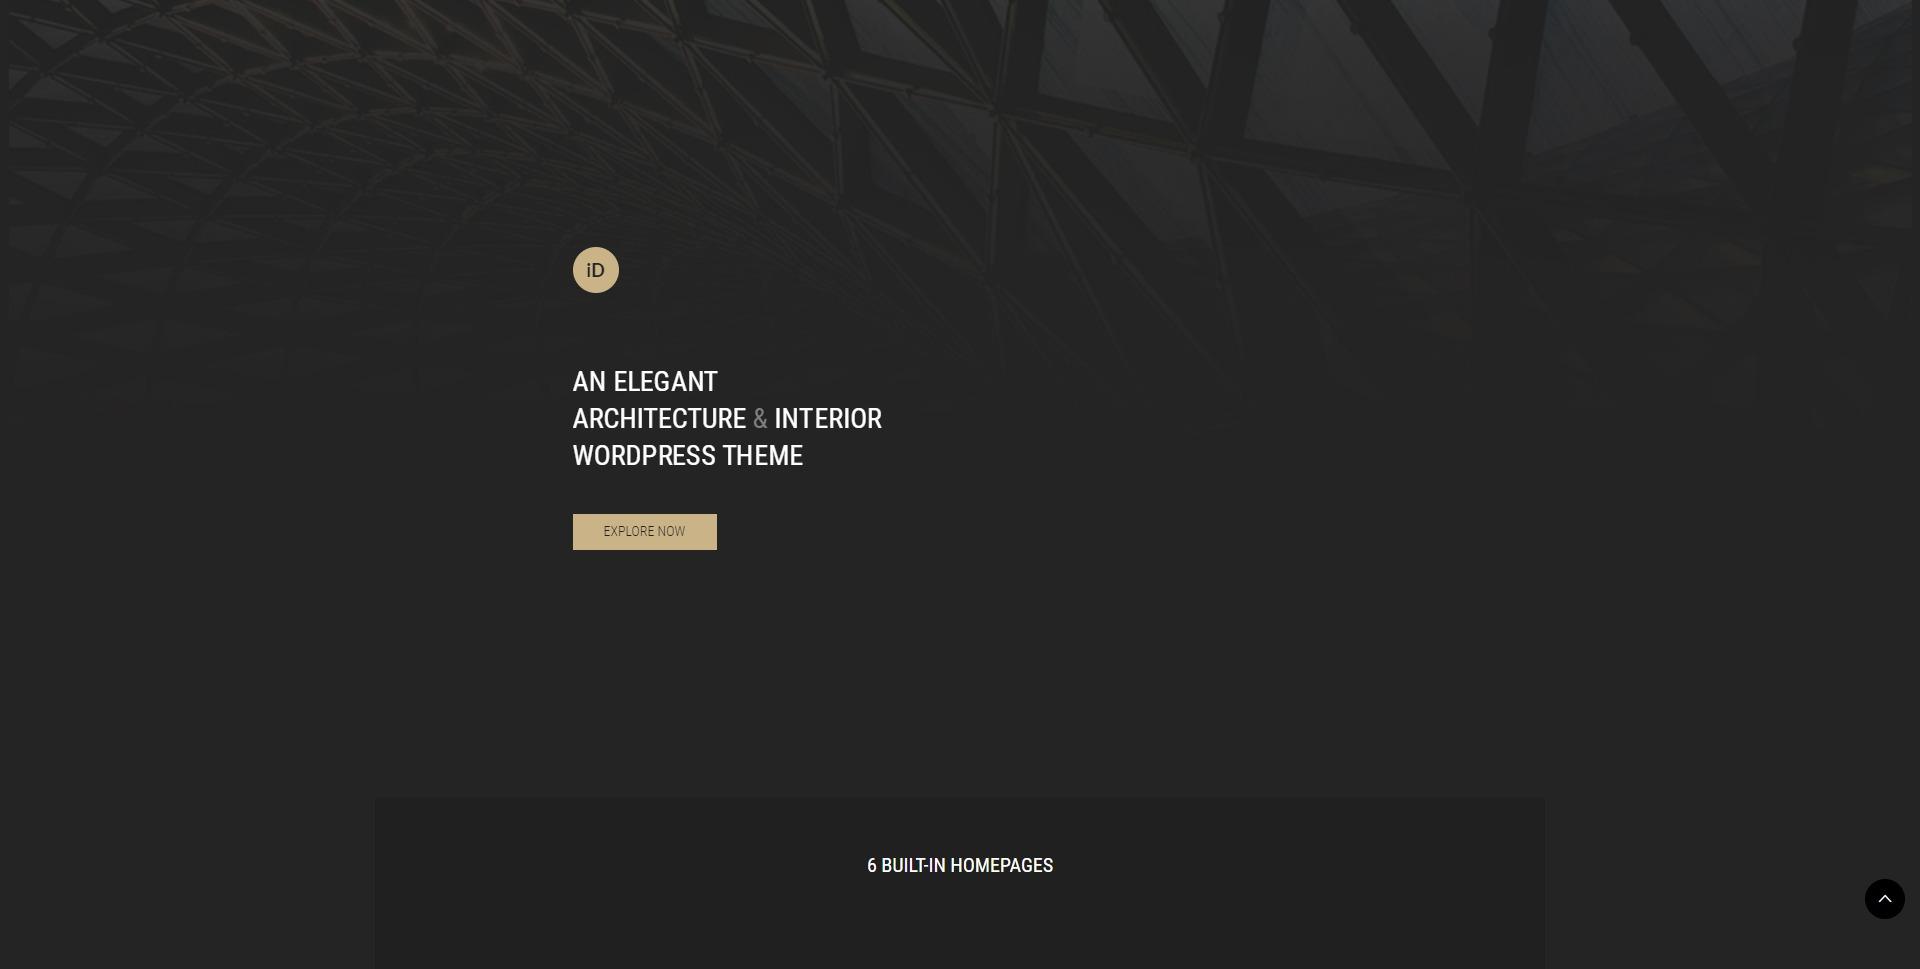 Insidect-室内装修建筑设计效果展示WordPress主题